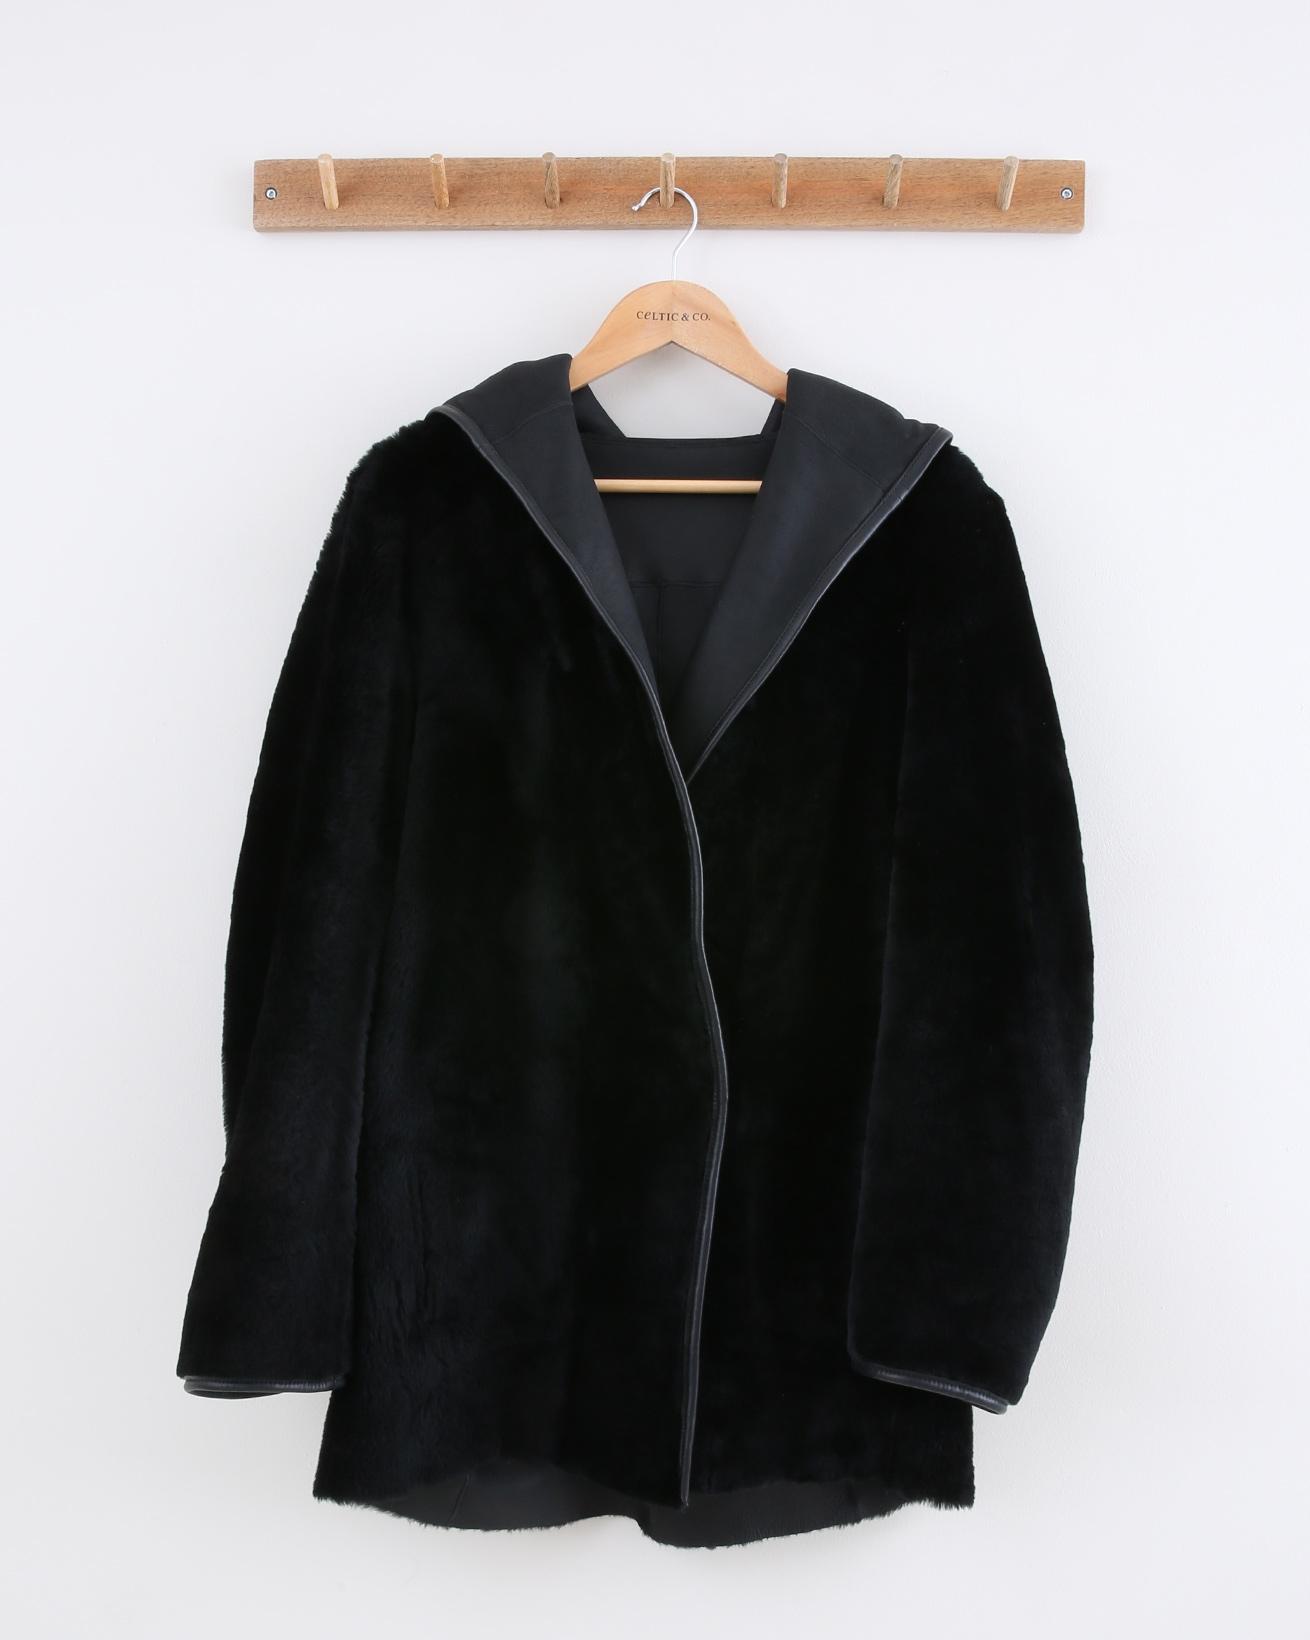 Reversible Hooded Wrap Jacket - Size 10 - Black - 1486